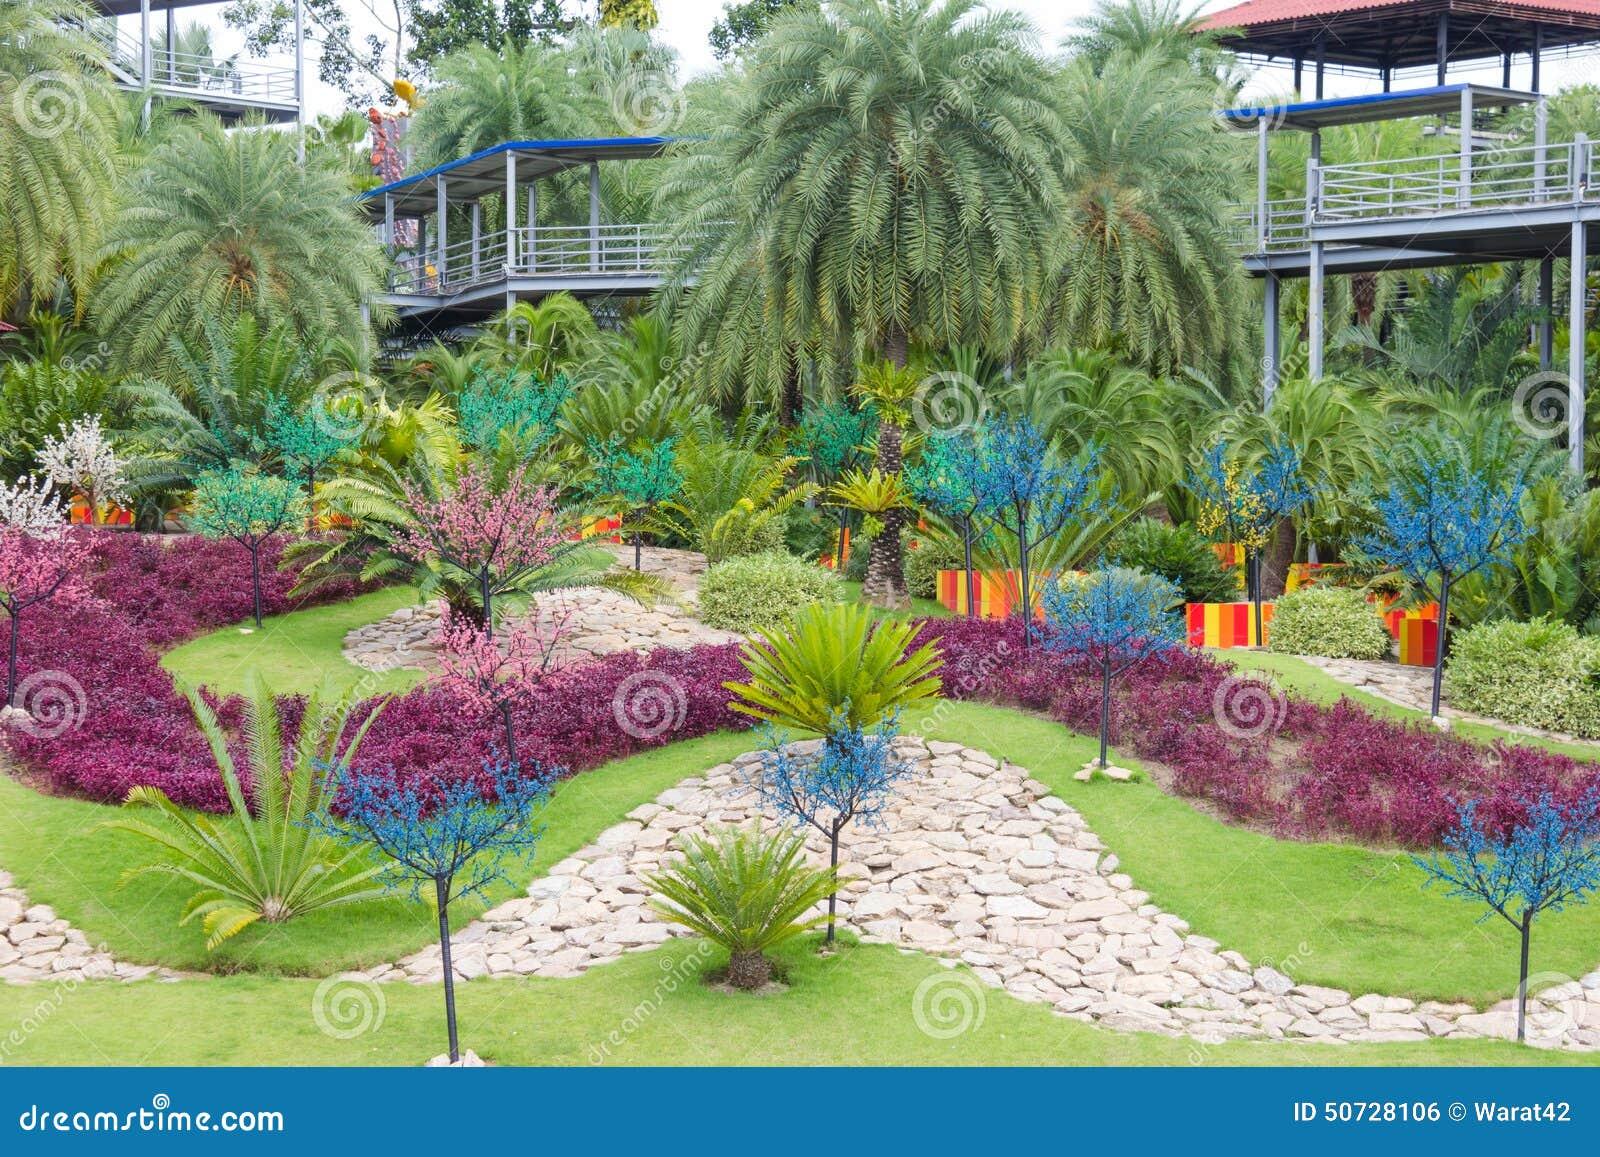 the garden decoration in nong nooch tropical garden in pattaya